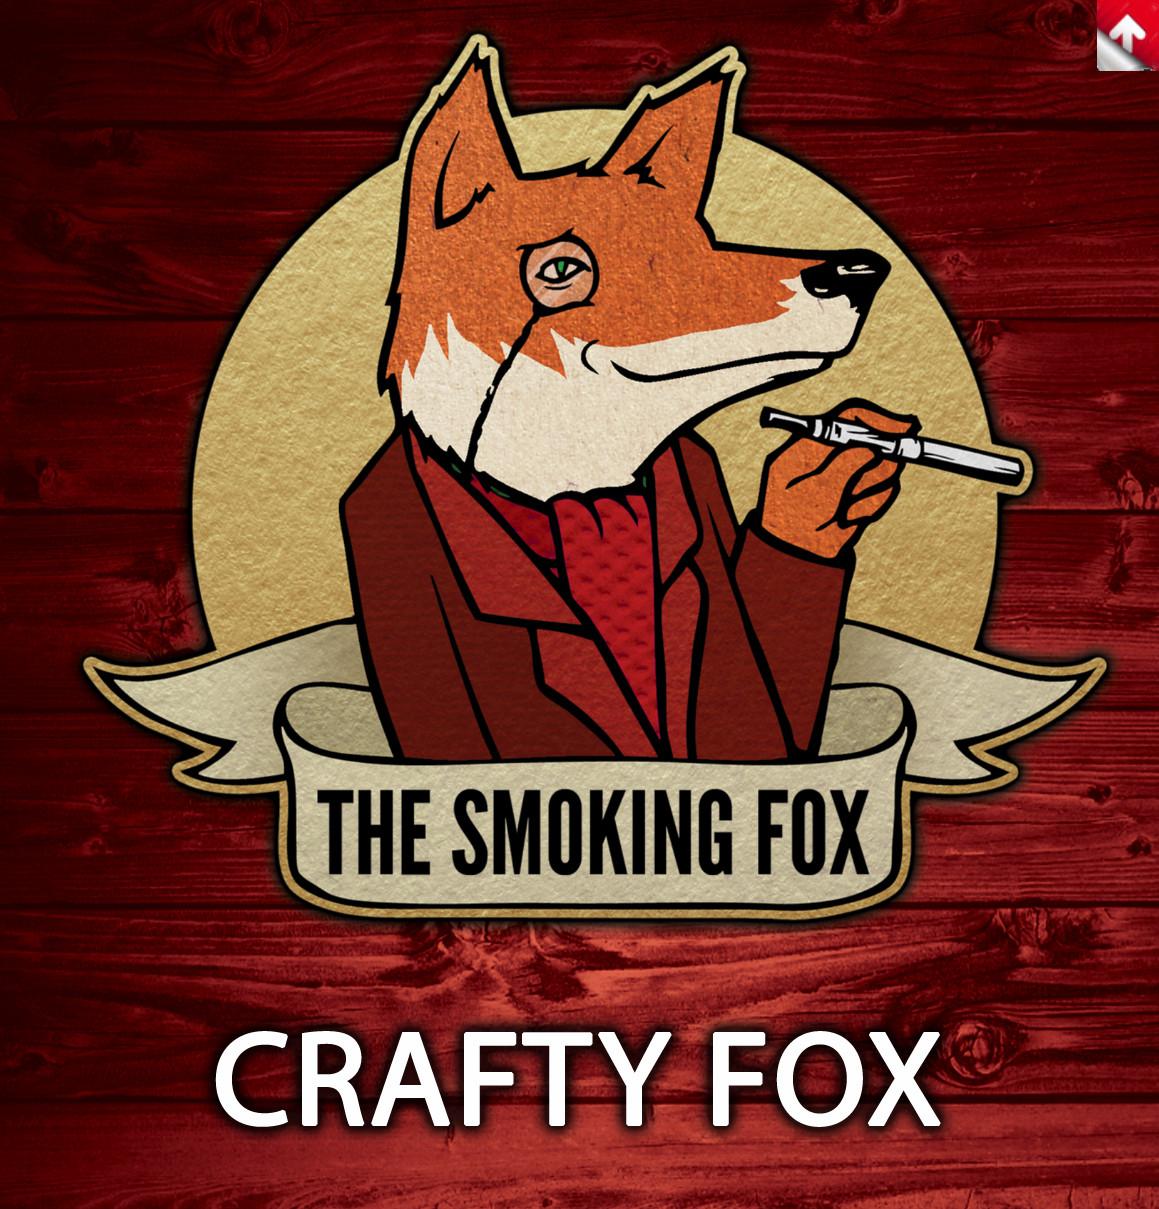 SMOKING FOX 10ml - CRAFTY FOX